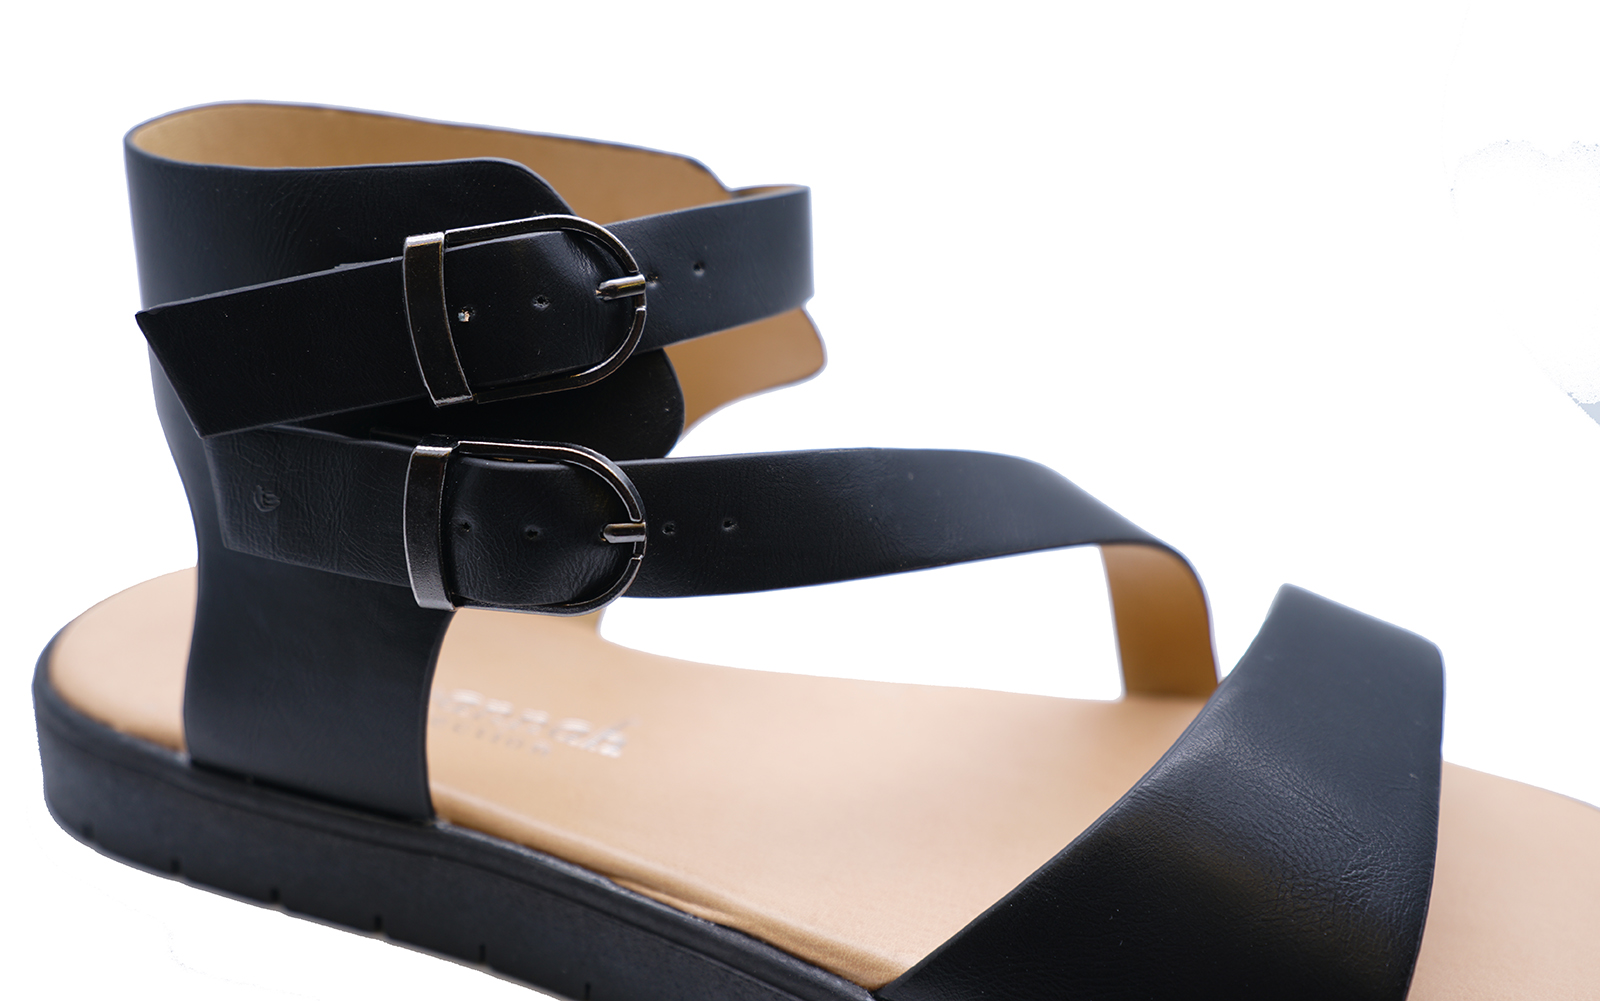 LADIES BLACK FLAT GLADIATOR SUMMER SANDALS COMFY WALKING ANKLE SHOES SIZES 3-8